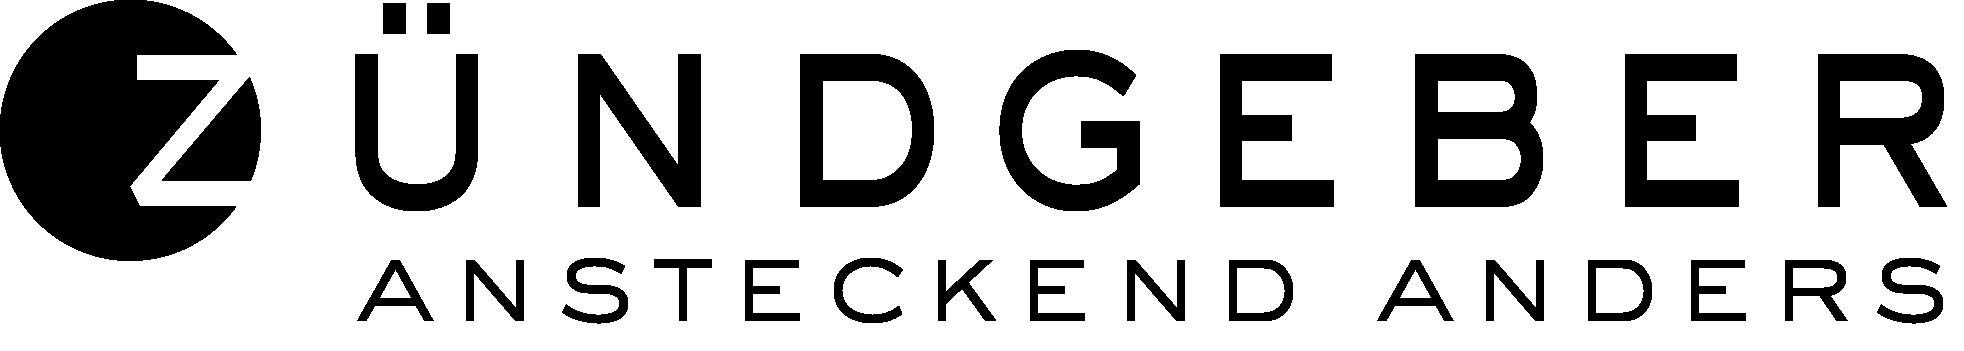 Zündgeber